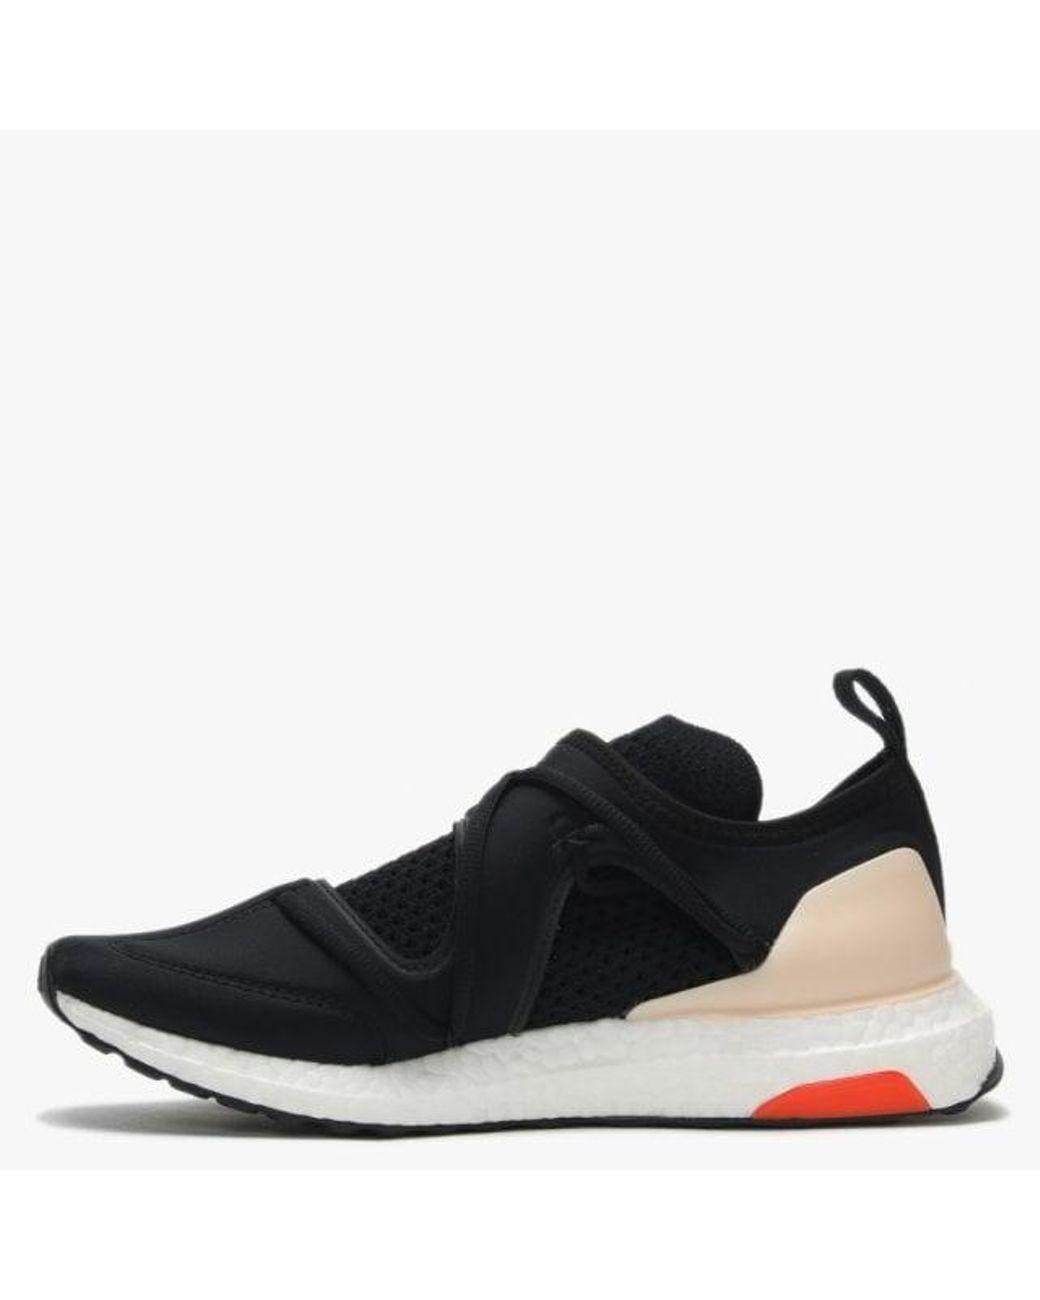 685fef231 Lyst - Stella McCartney X Adidas Ultraboost T.s. Black Trainers in Black -  Save 2%